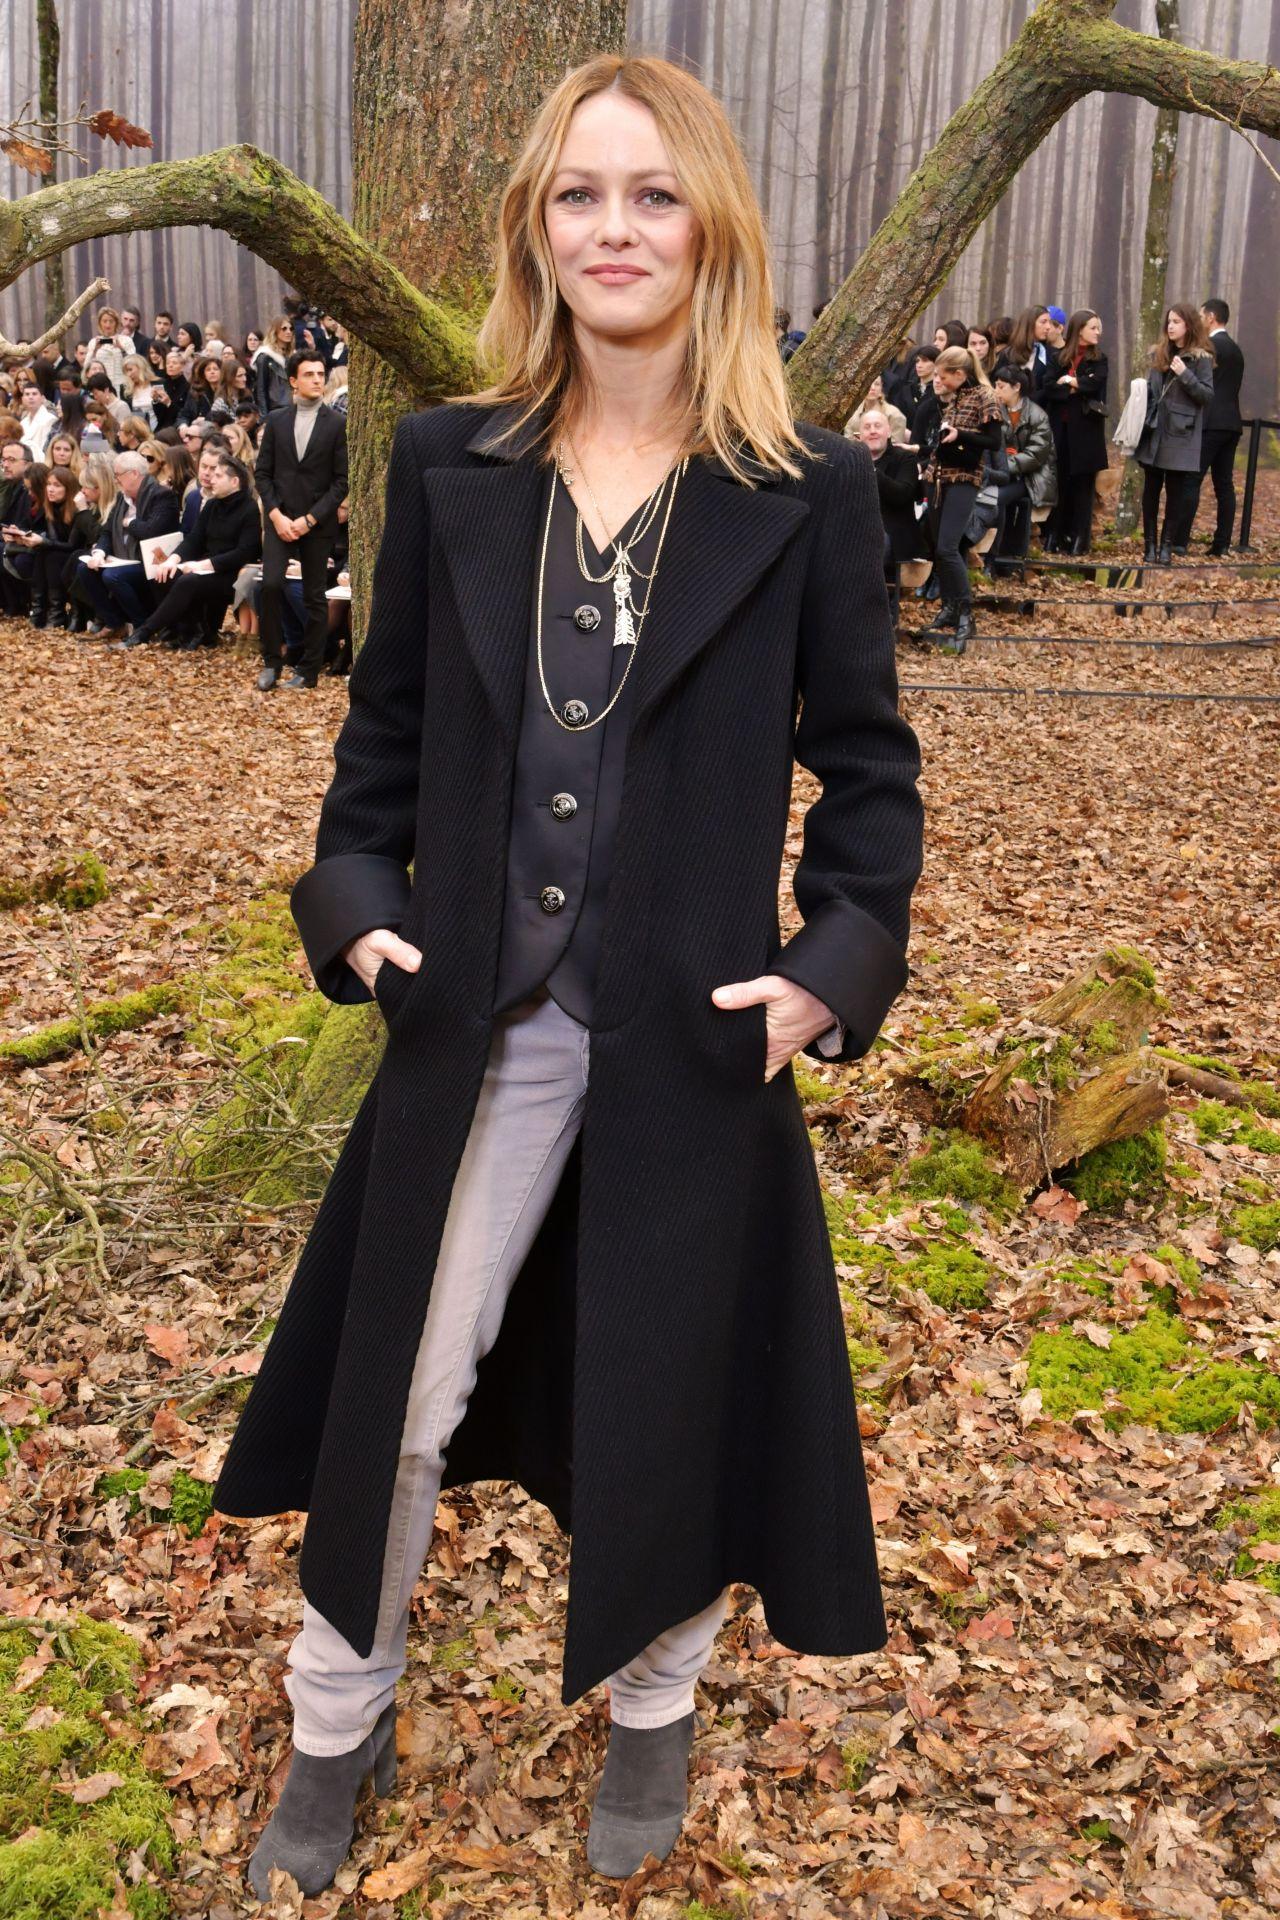 http://celebmafia.com/wp-content/uploads/2018/03/vanessa-paradis-chanel-fashion-show-fw18-in-paris-8.jpg